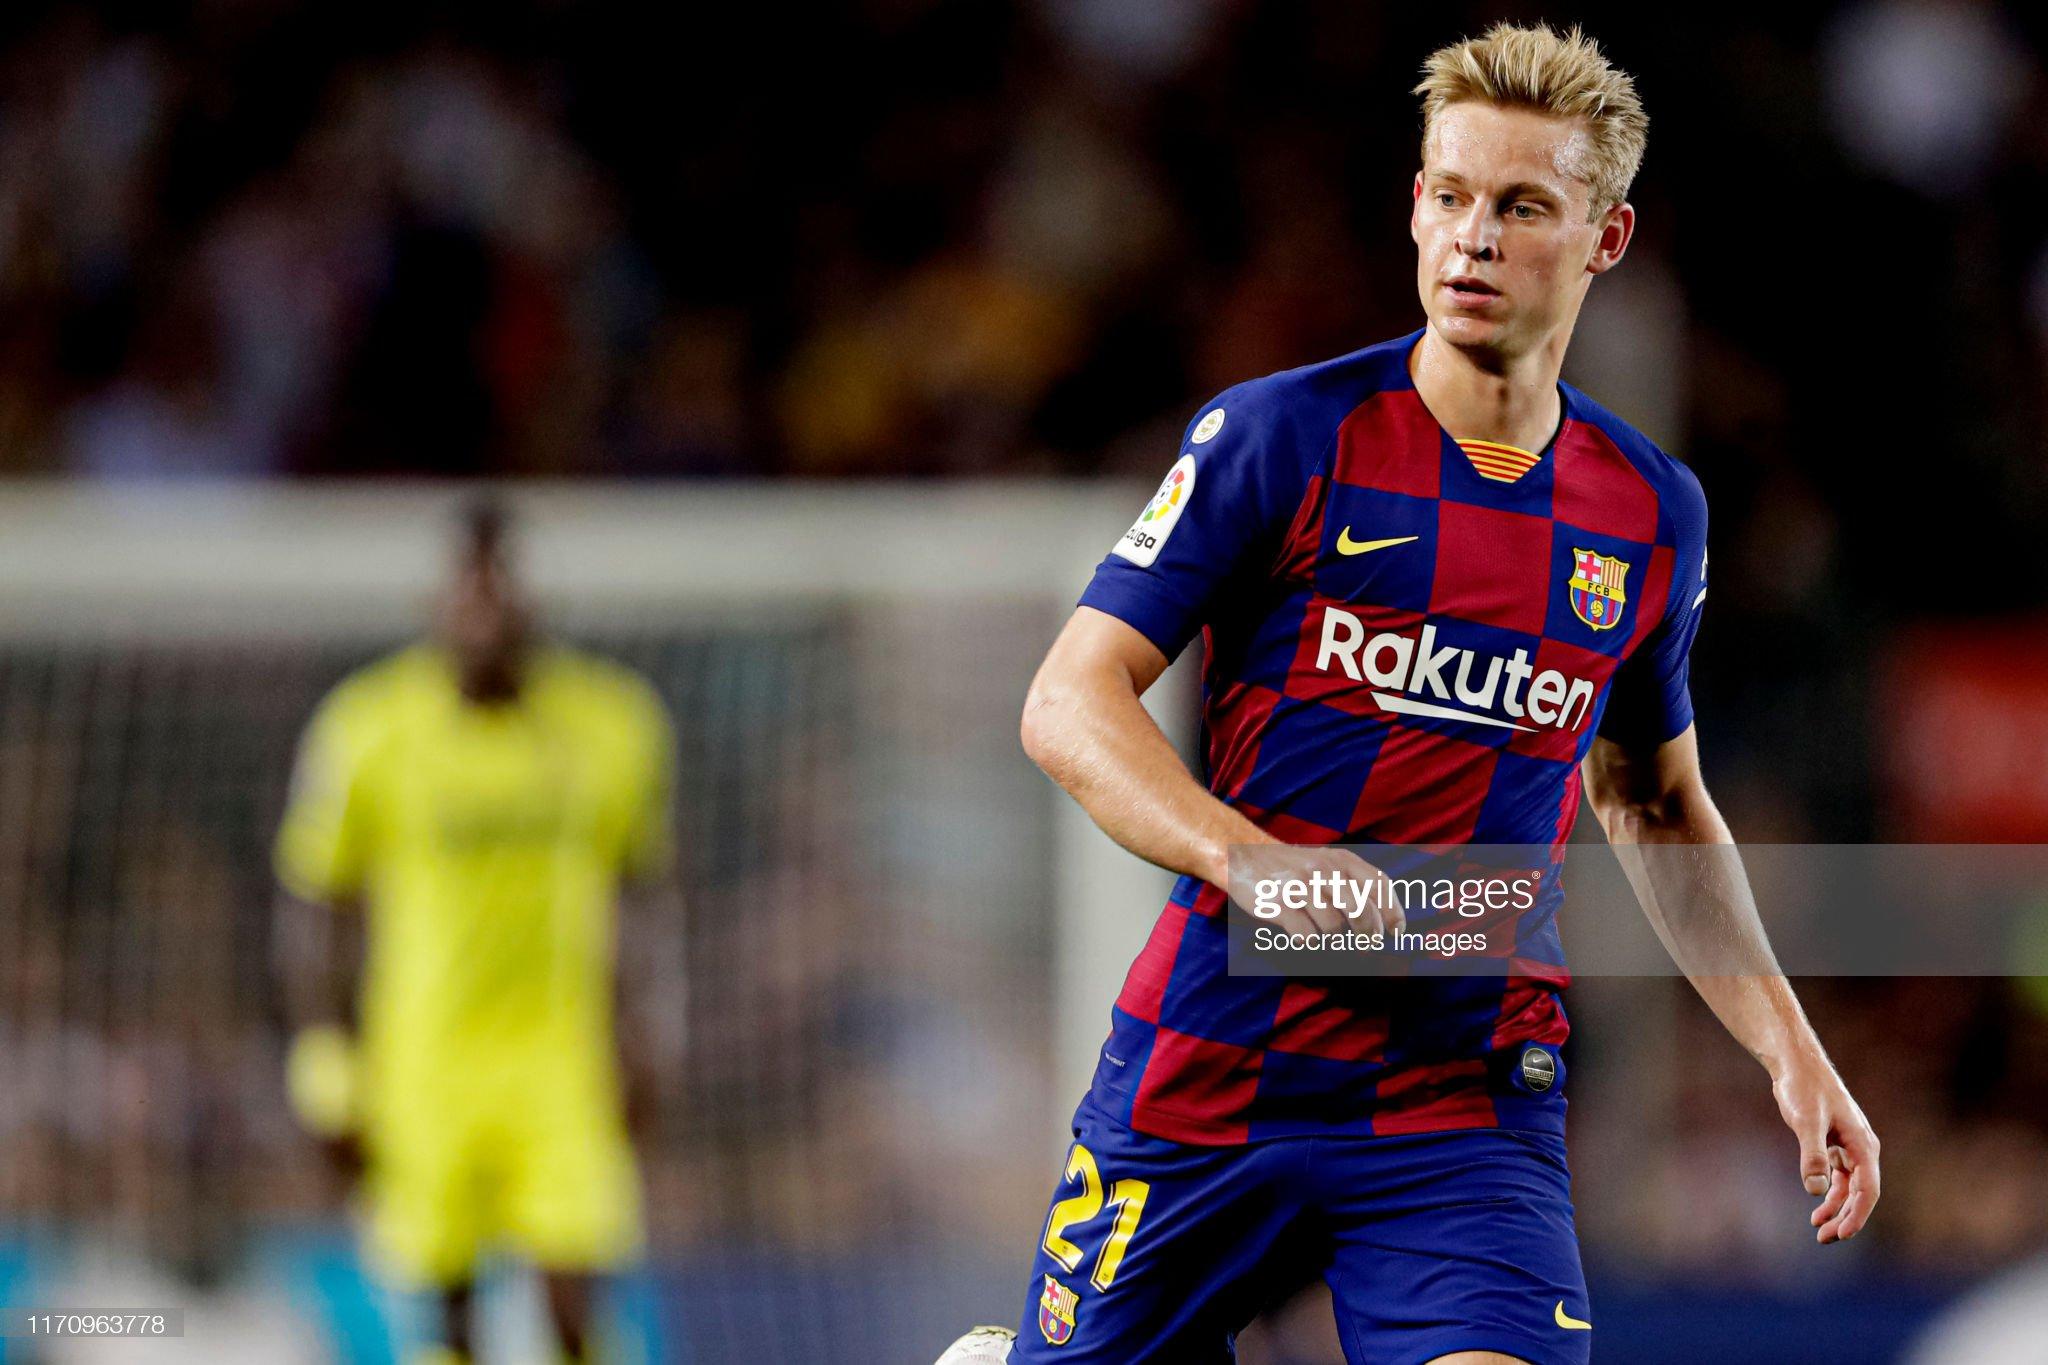 صور مباراة : برشلونة - فياريال 2-1 ( 24-09-2019 )  Frenkie-de-jong-of-fc-barcelona-during-the-la-liga-santander-match-picture-id1170963778?s=2048x2048